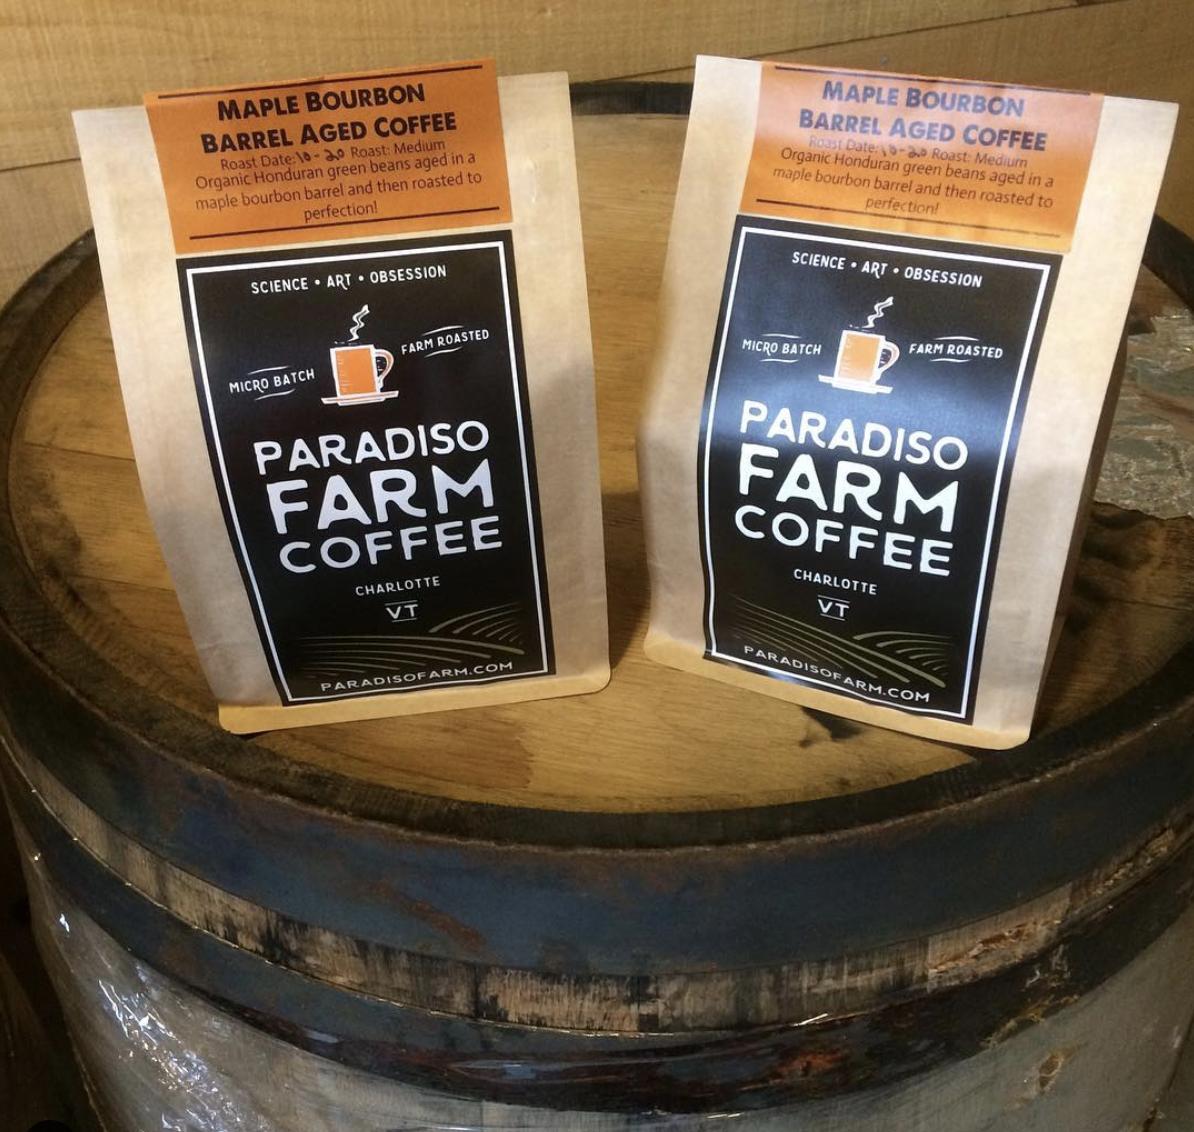 Source: Paradiso Farm Coffee